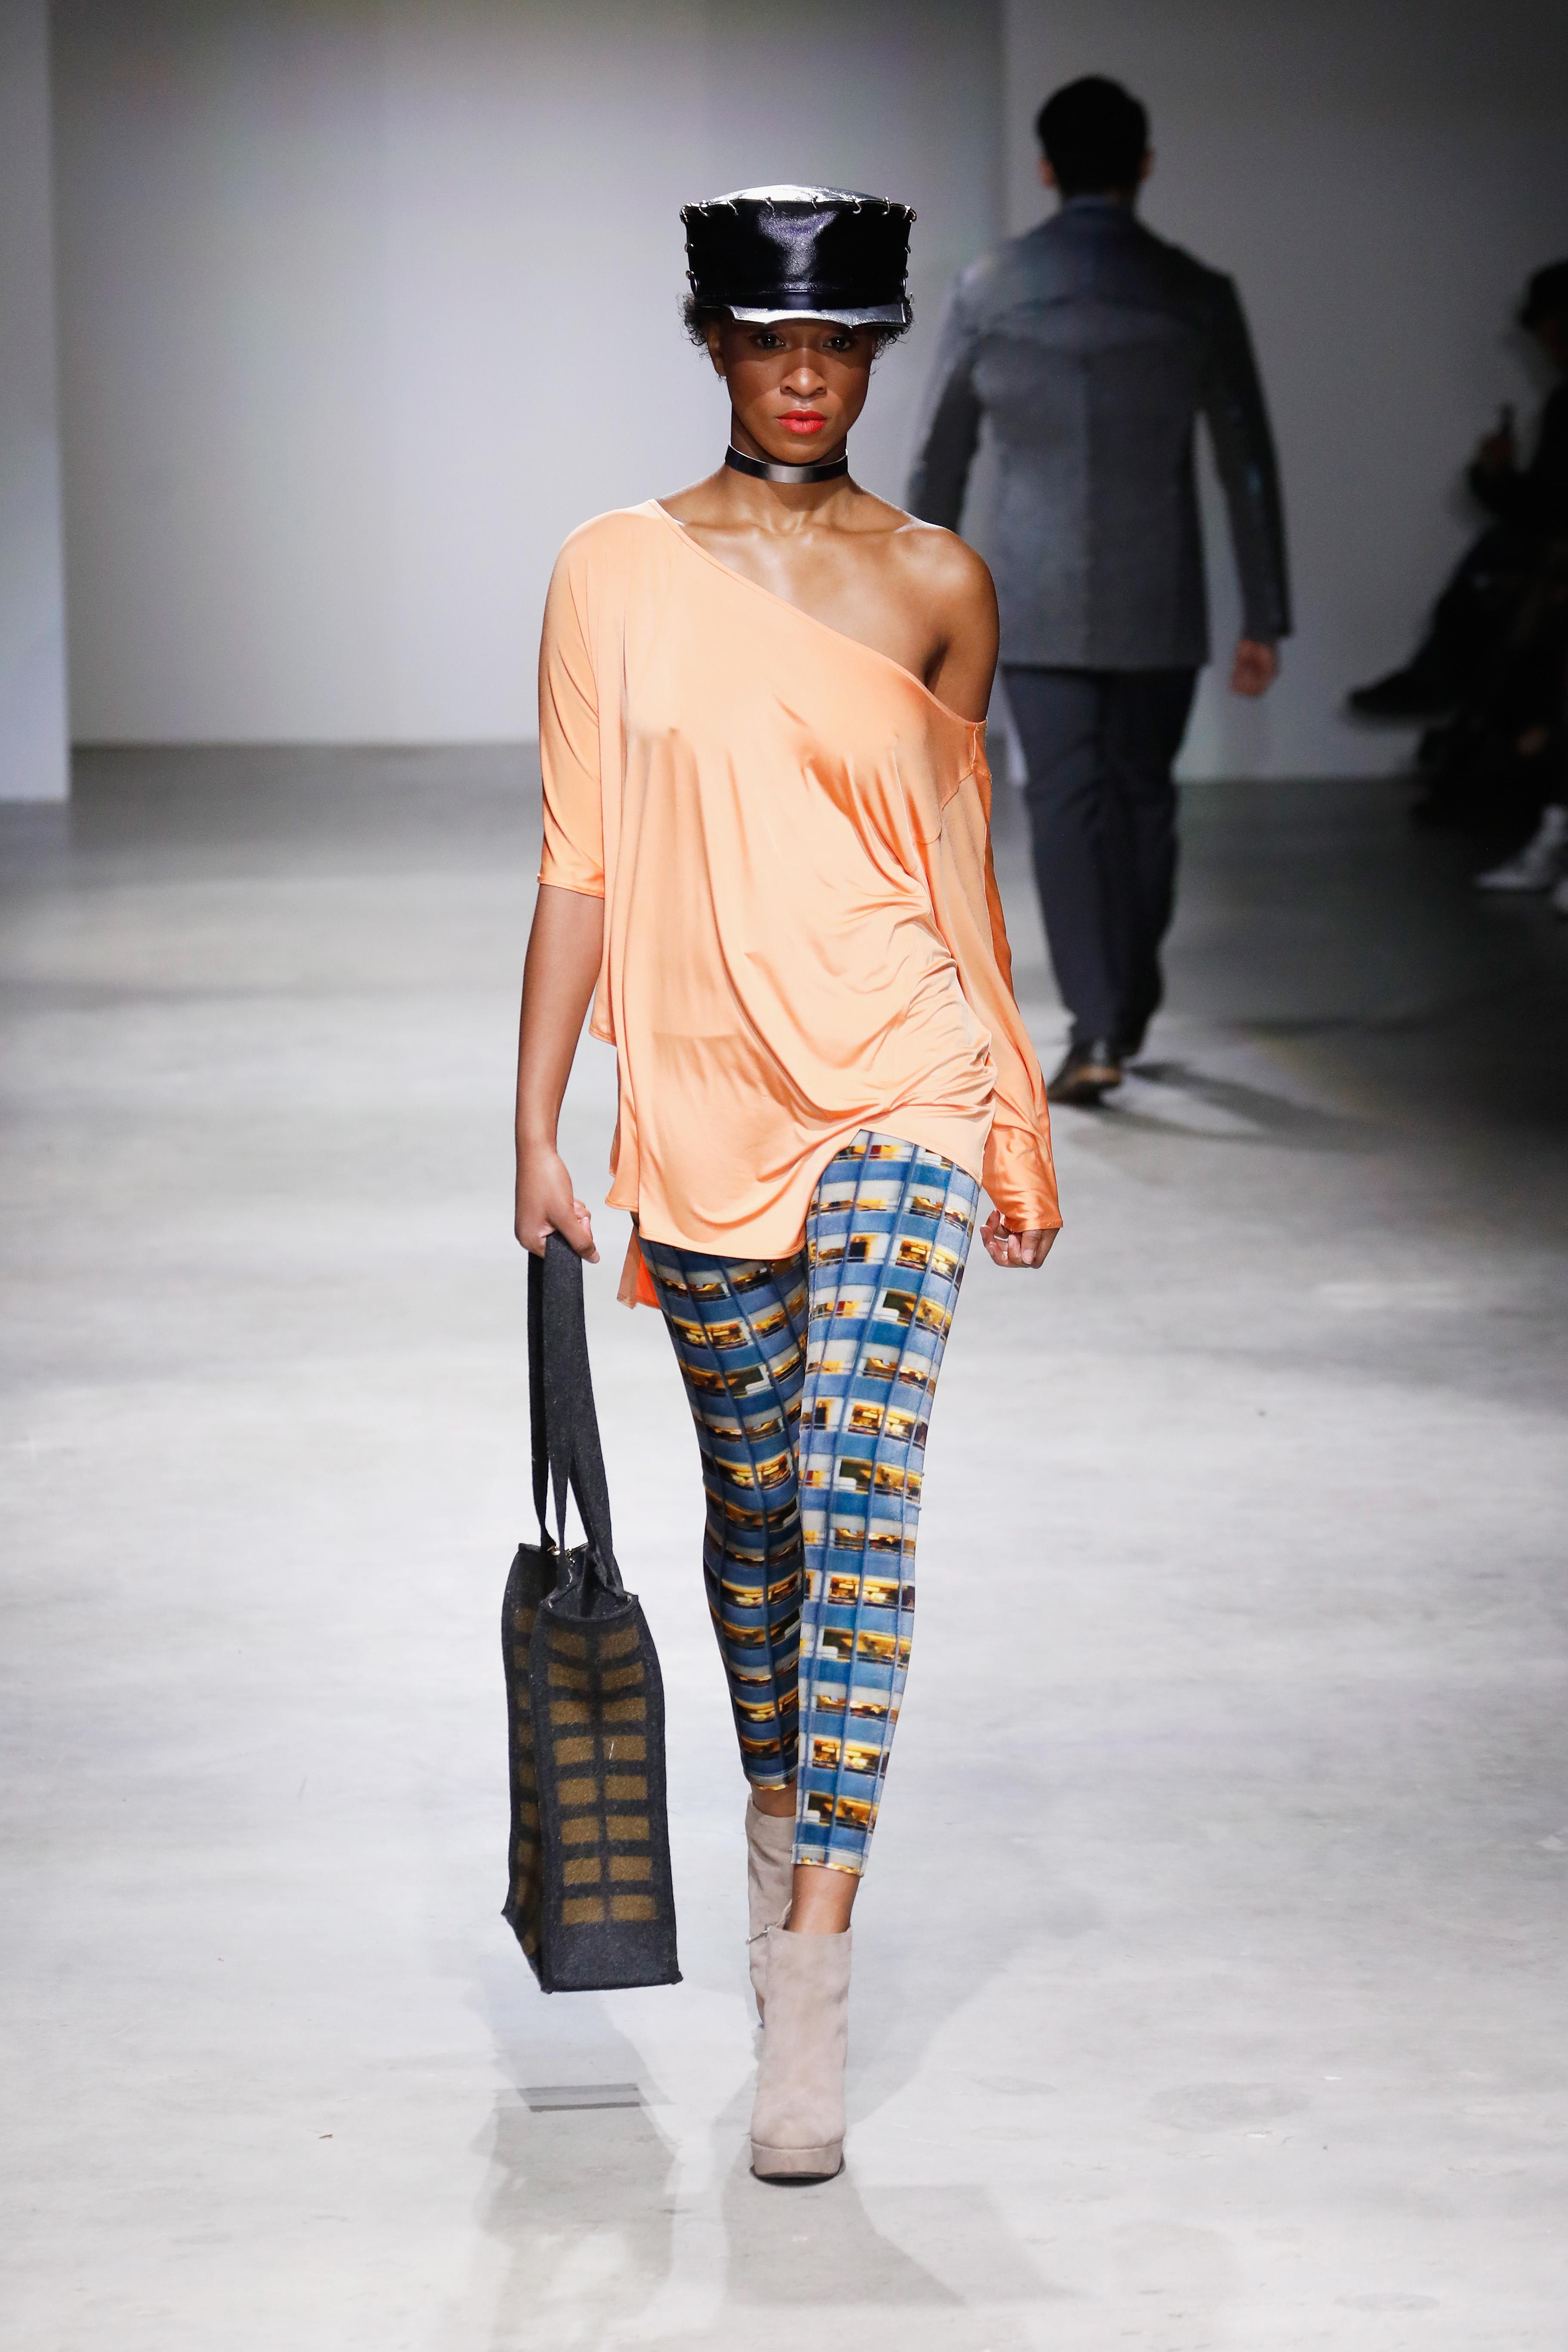 Nolcha Shows New York Fashion Week Fall/Winter 2019 Presented By InstaSleep Mint Melts ACID NYC Runway Show